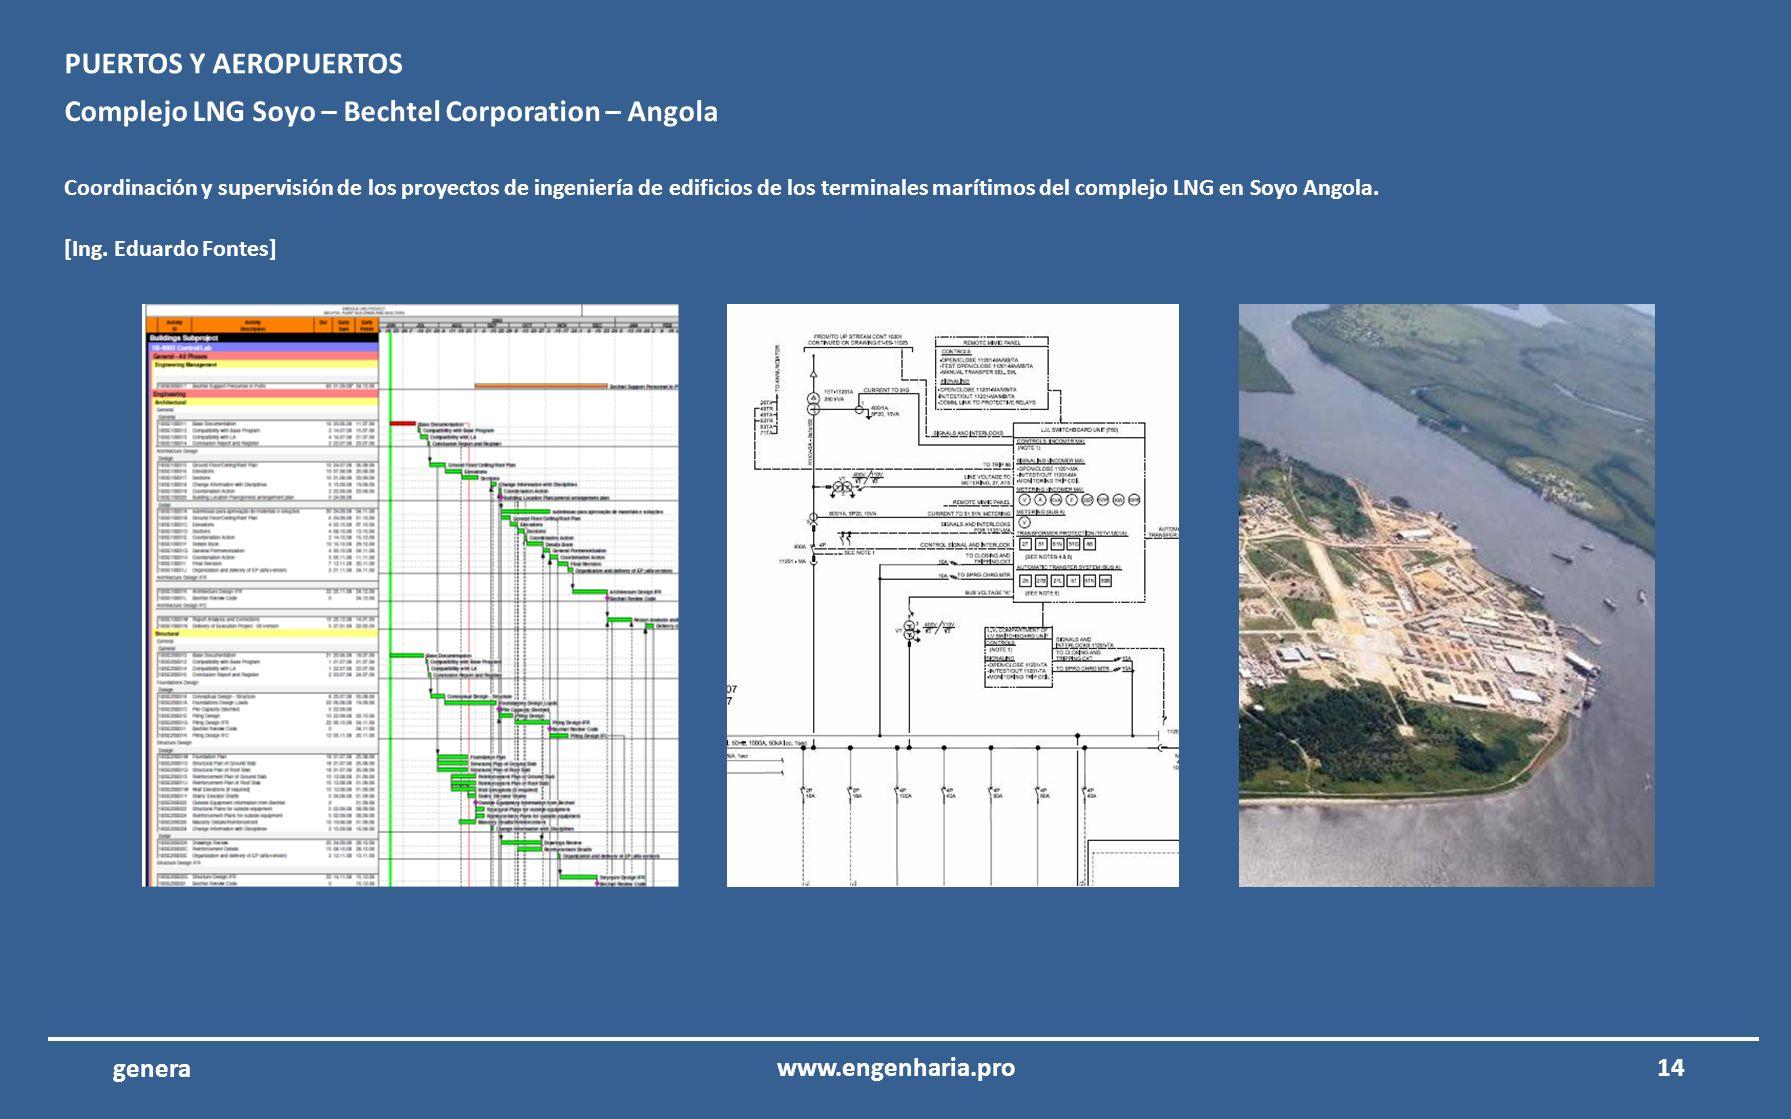 Complejo LNG Soyo – Bechtel Corporation – Angola